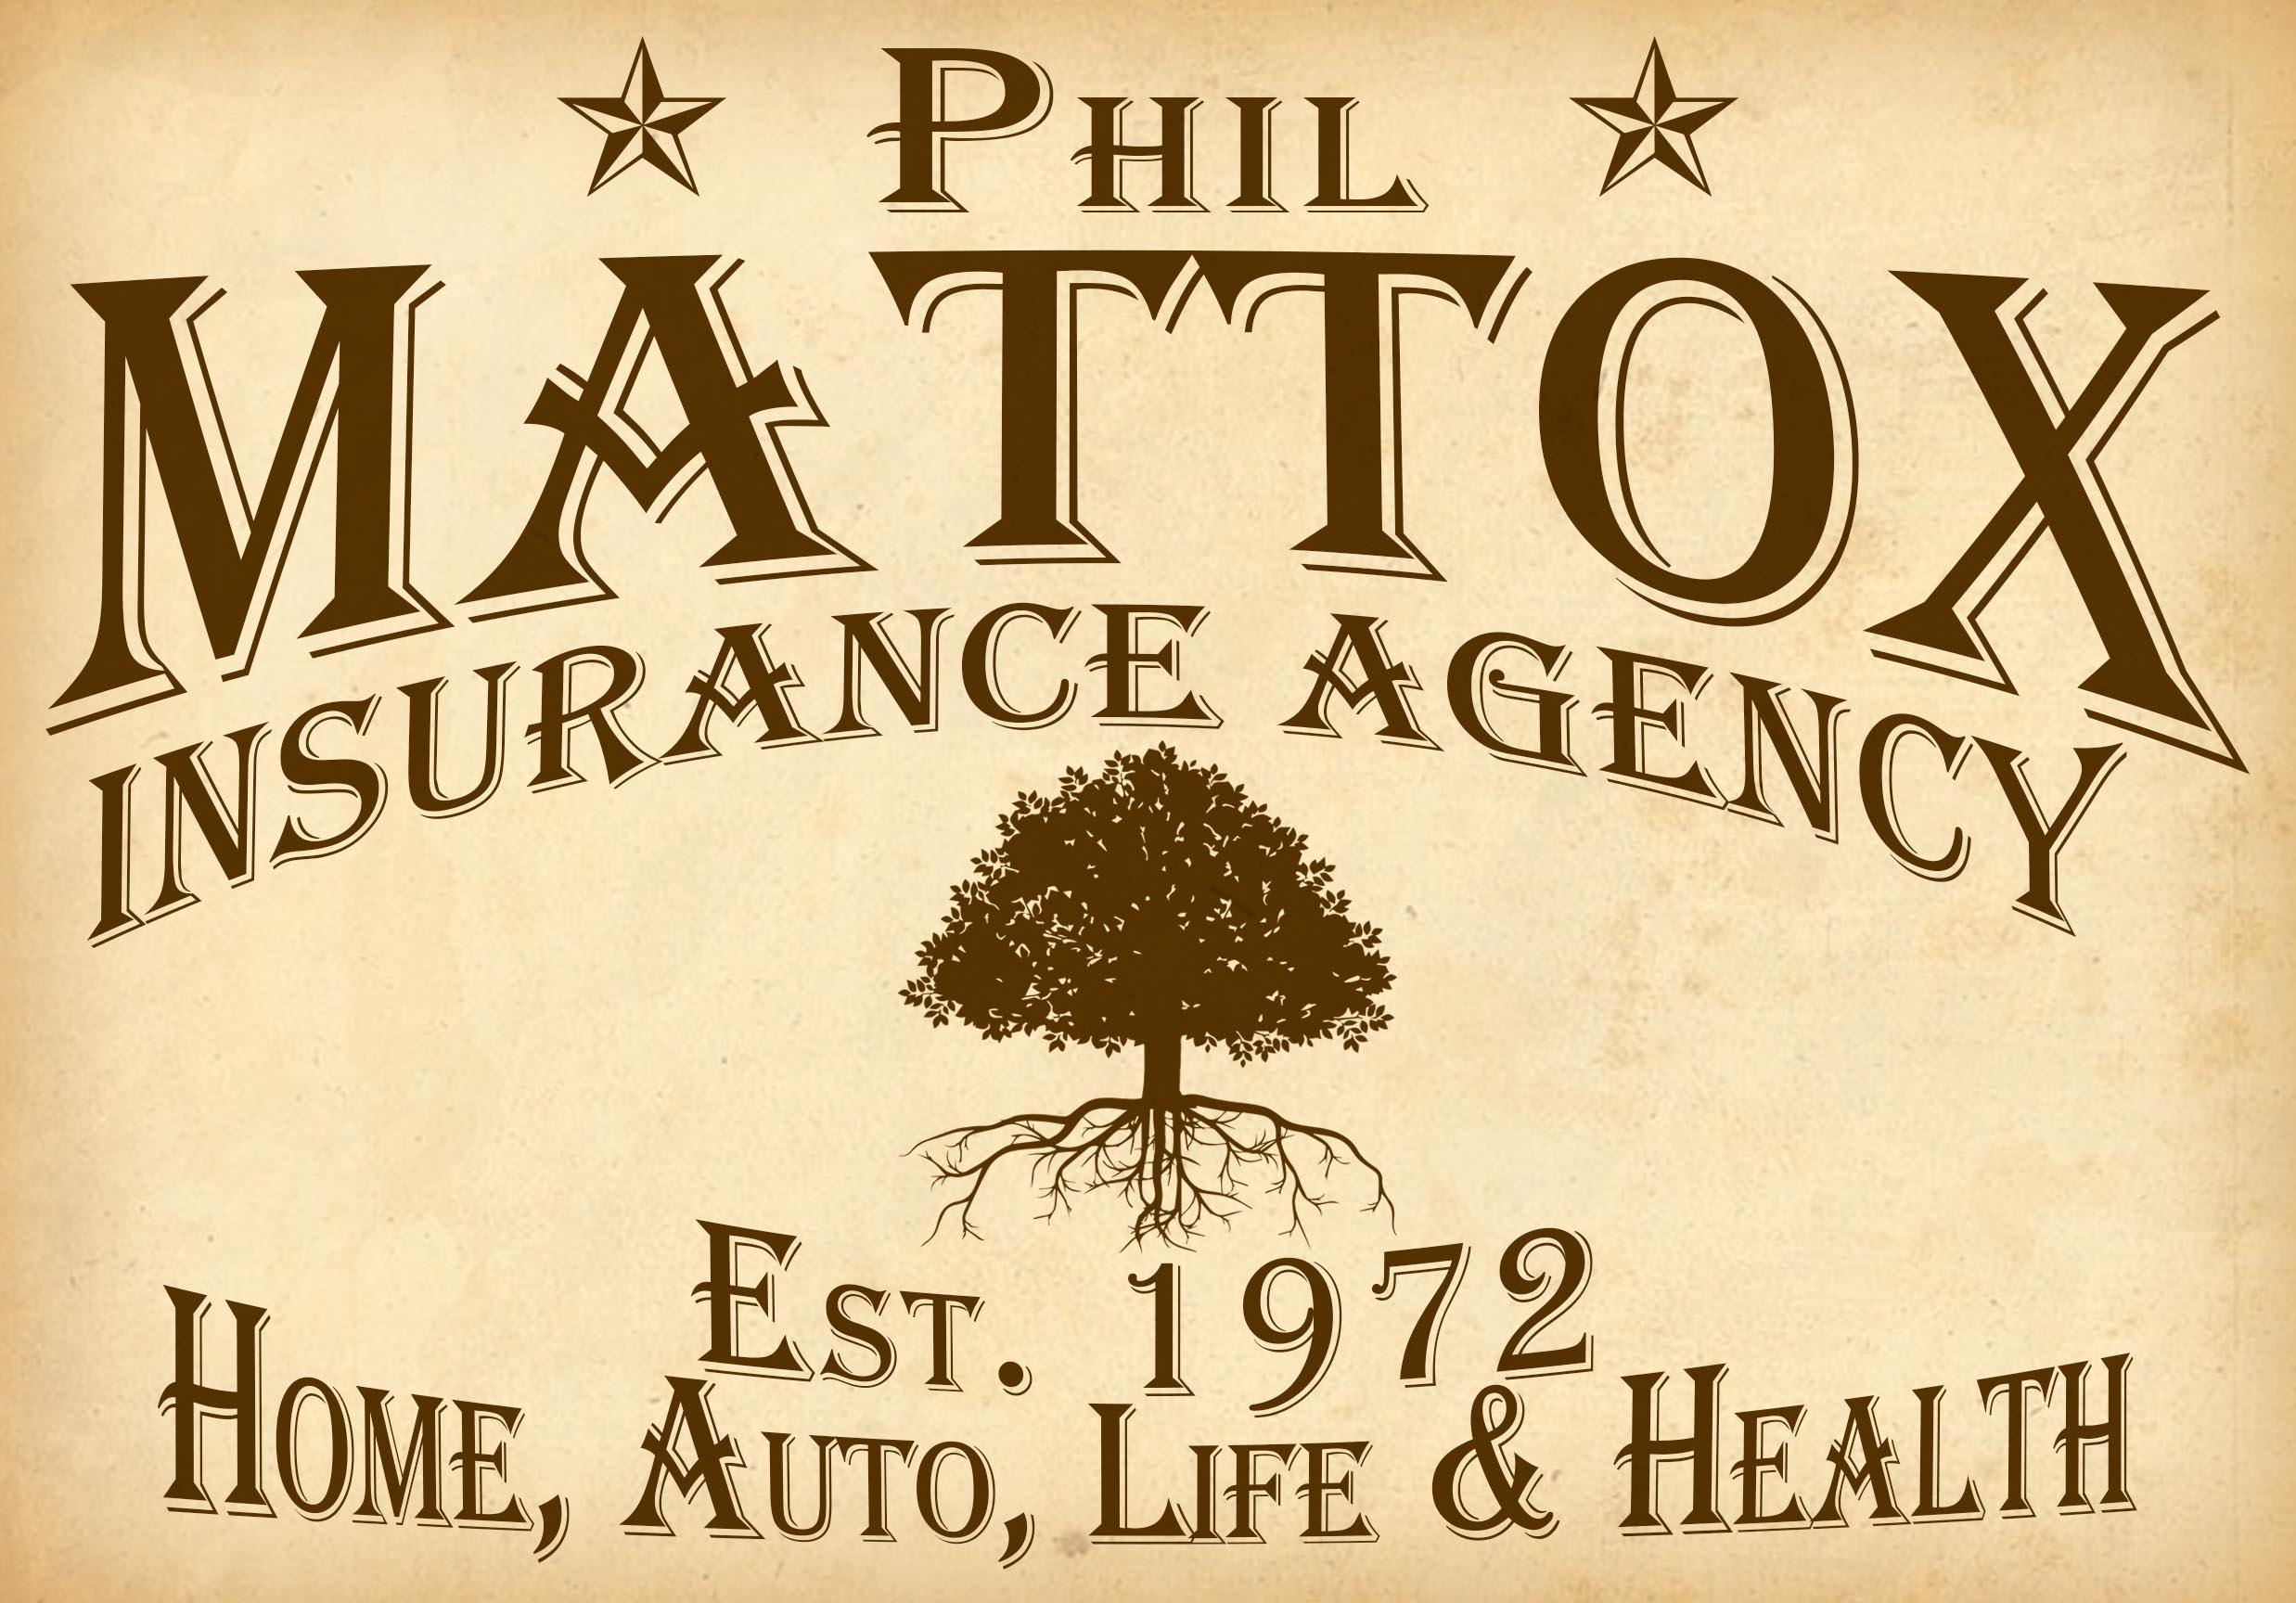 Phil Mattox Insurance Agency image 1